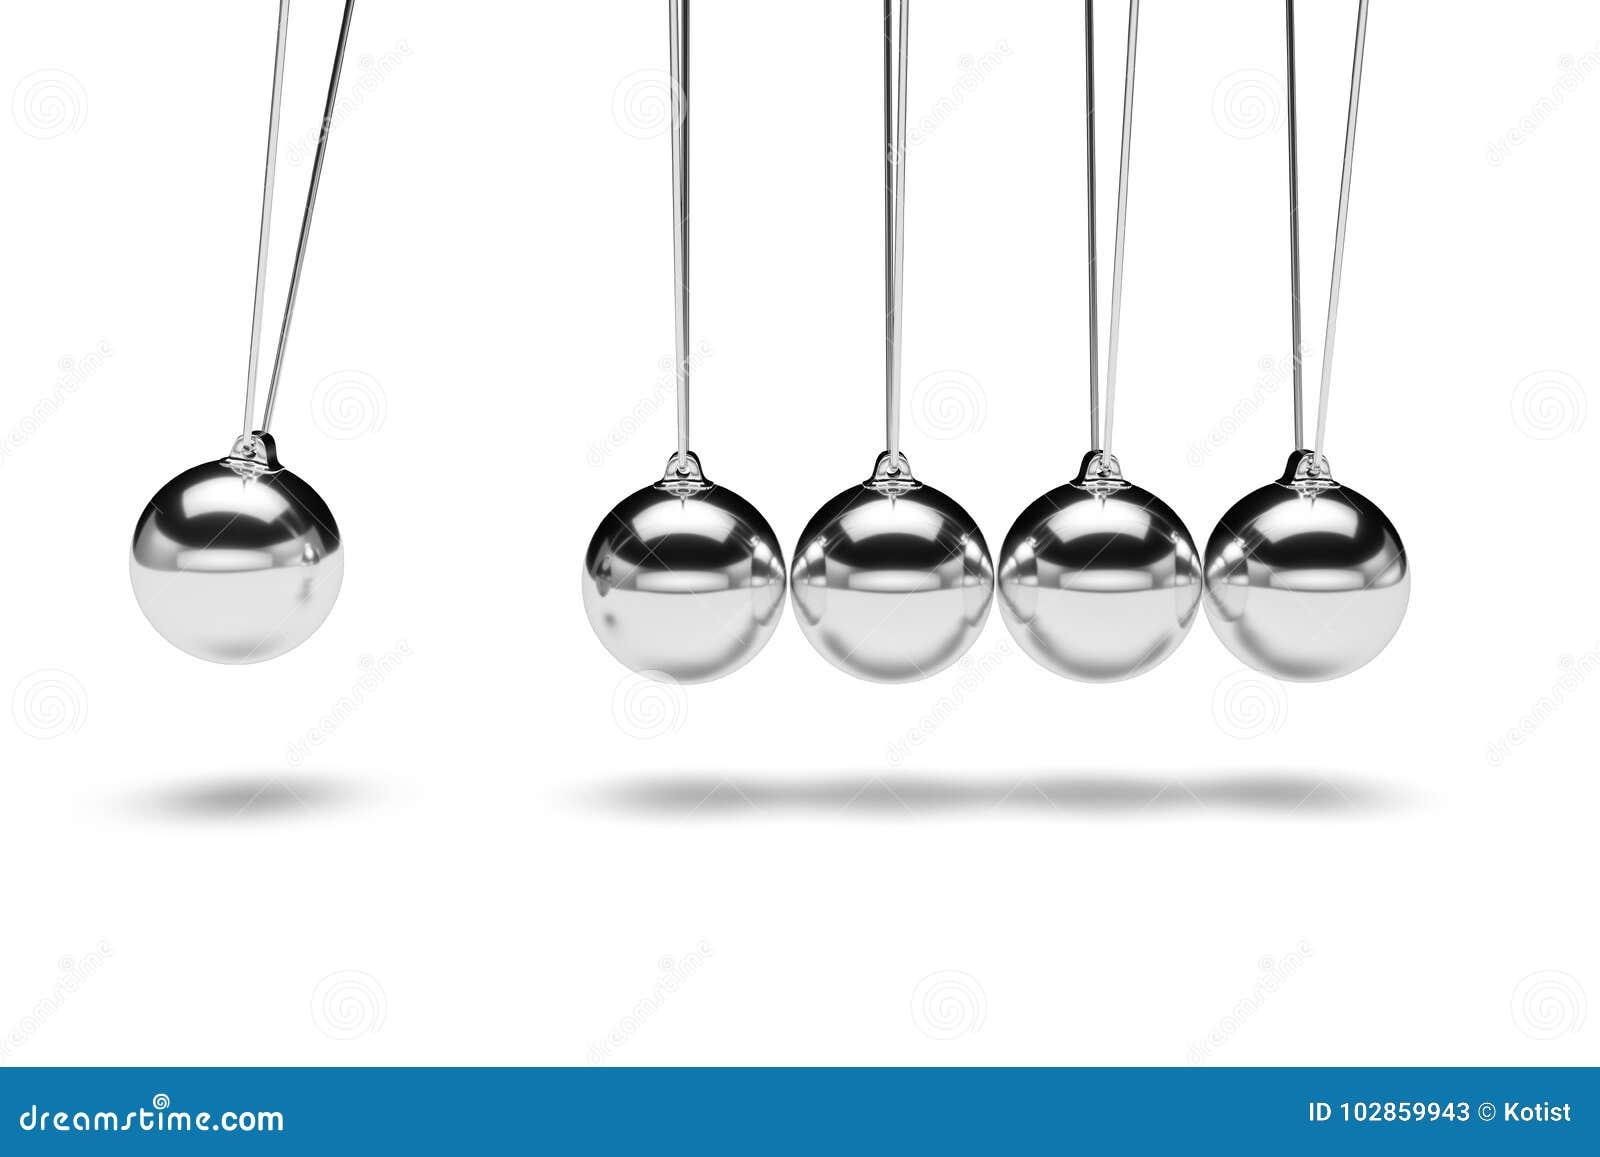 Balancing balls newton`s cradle